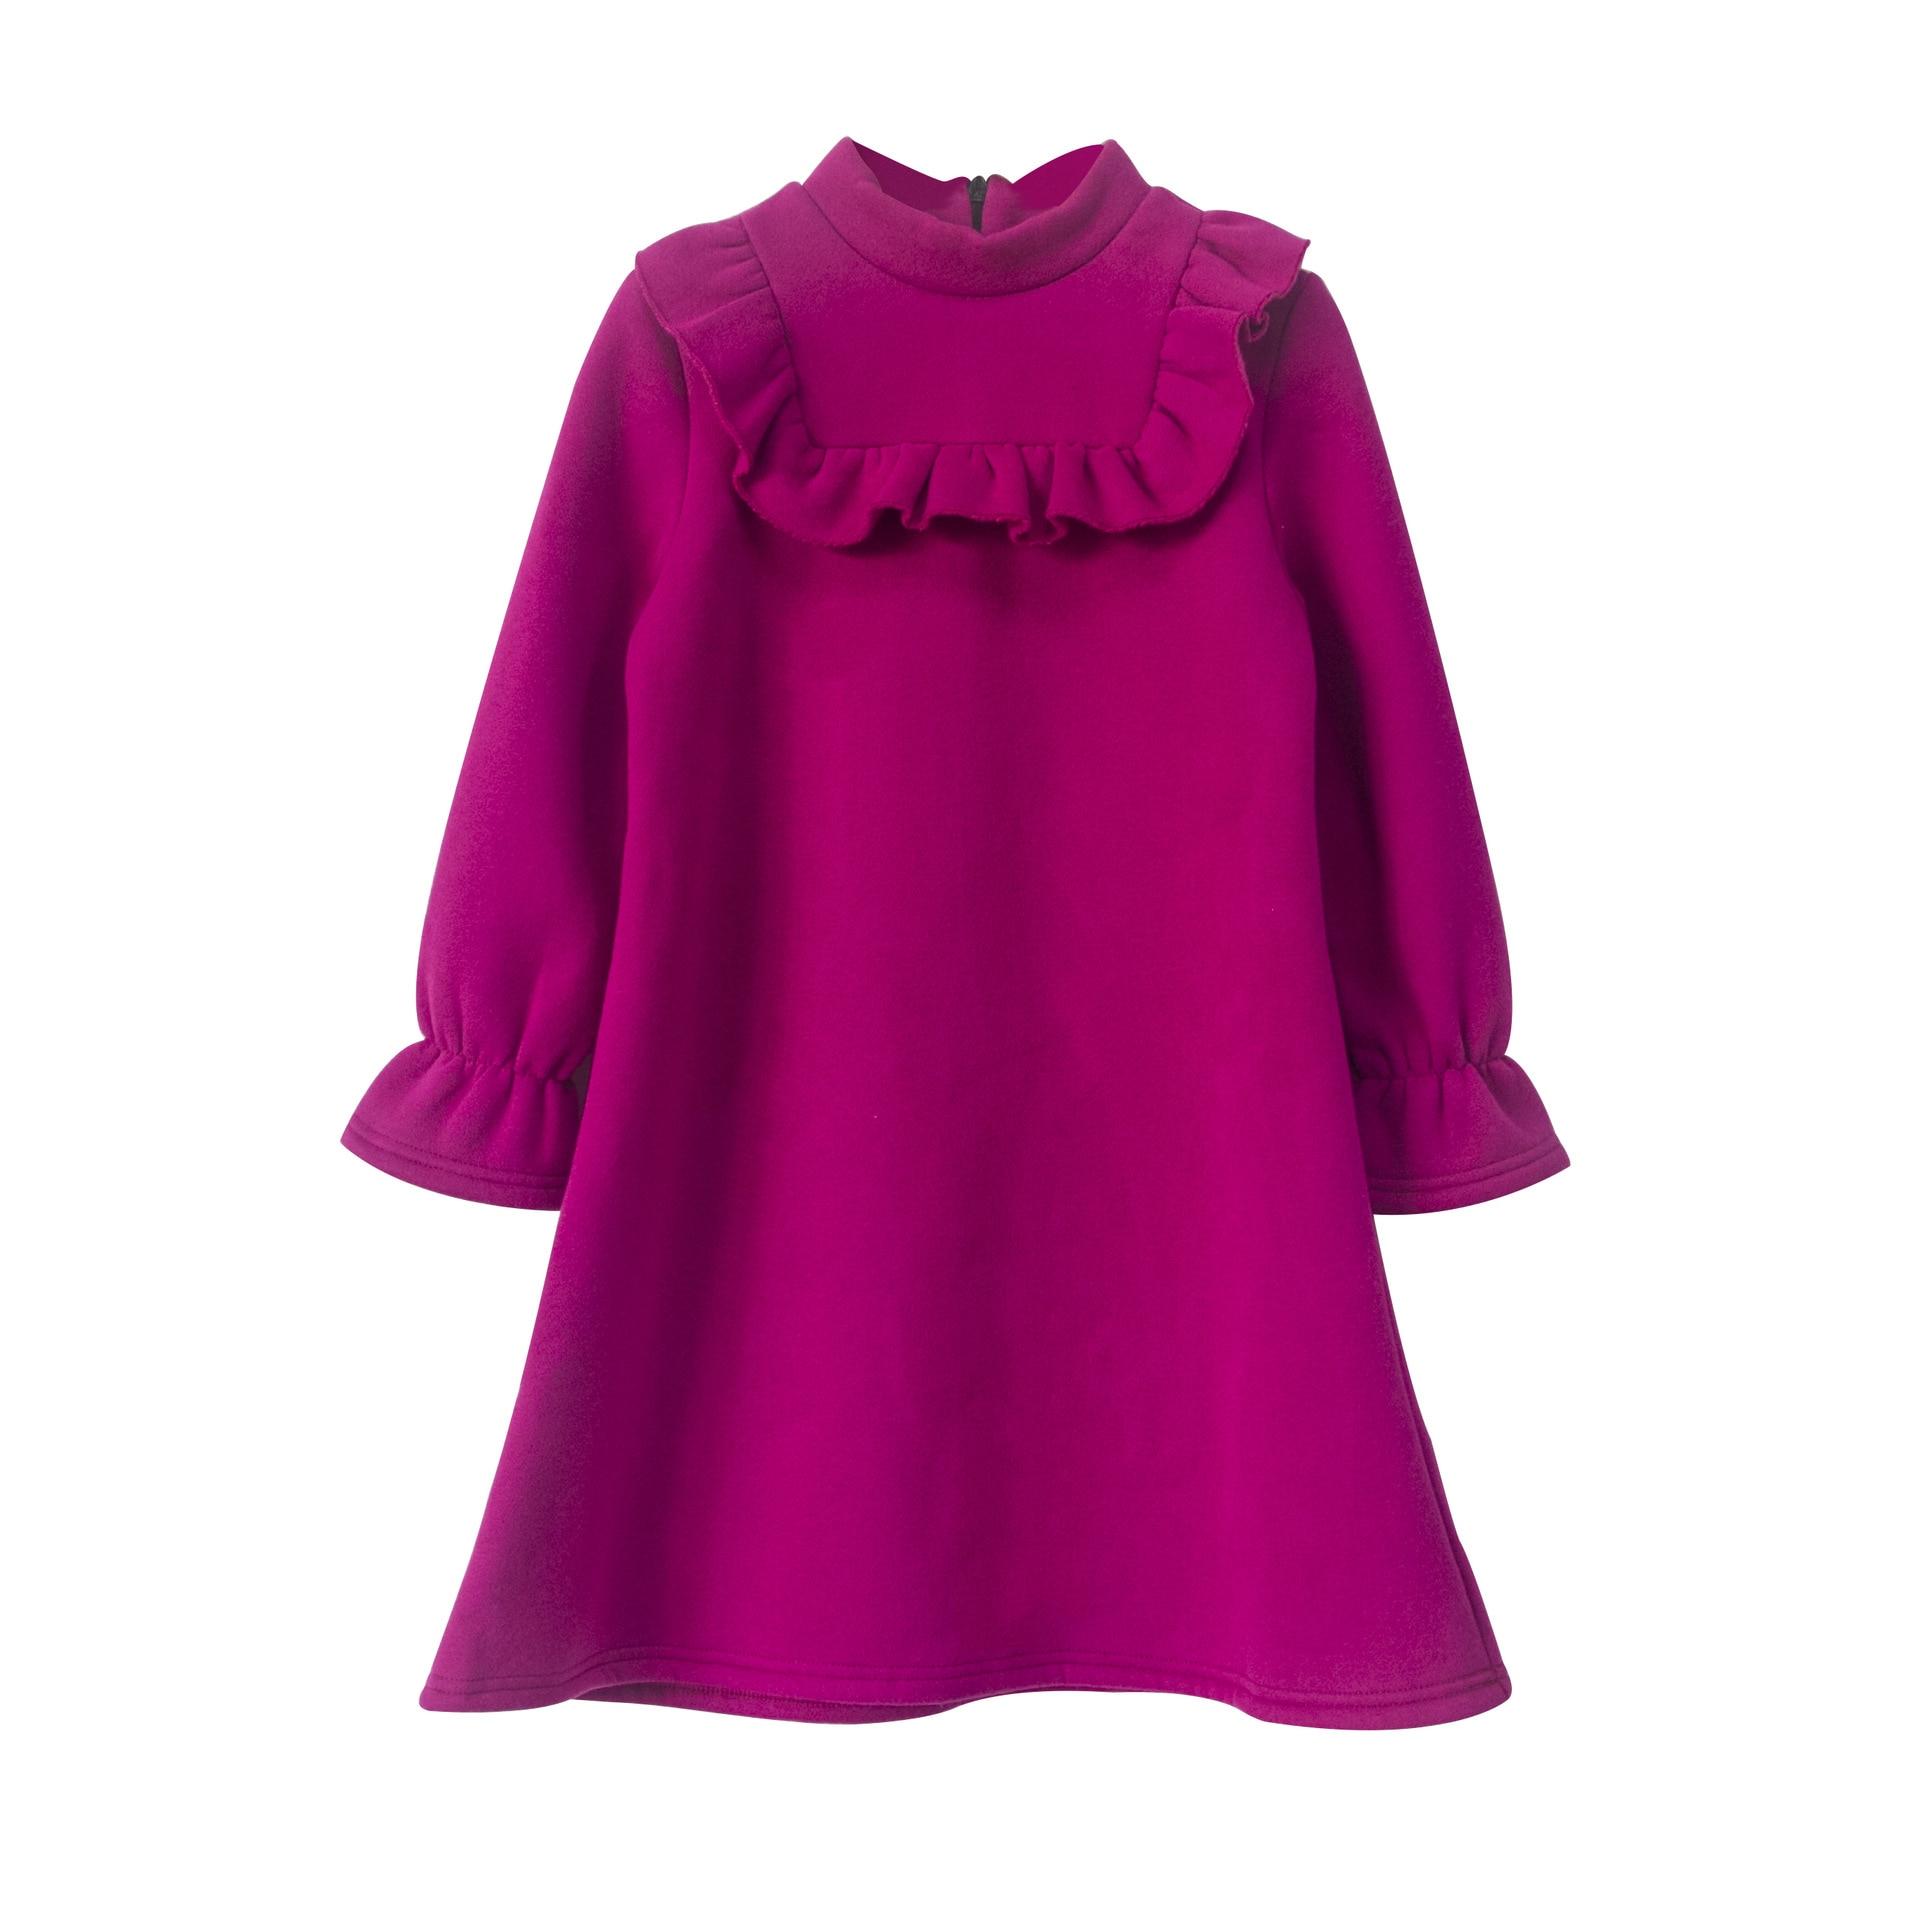 Thick Velvet Girls Dress 2018 Autumn Winter Teenager Girl Warm Fleece Purple Sweatshirt Dress Kids Ruffle Princess Party Frocks